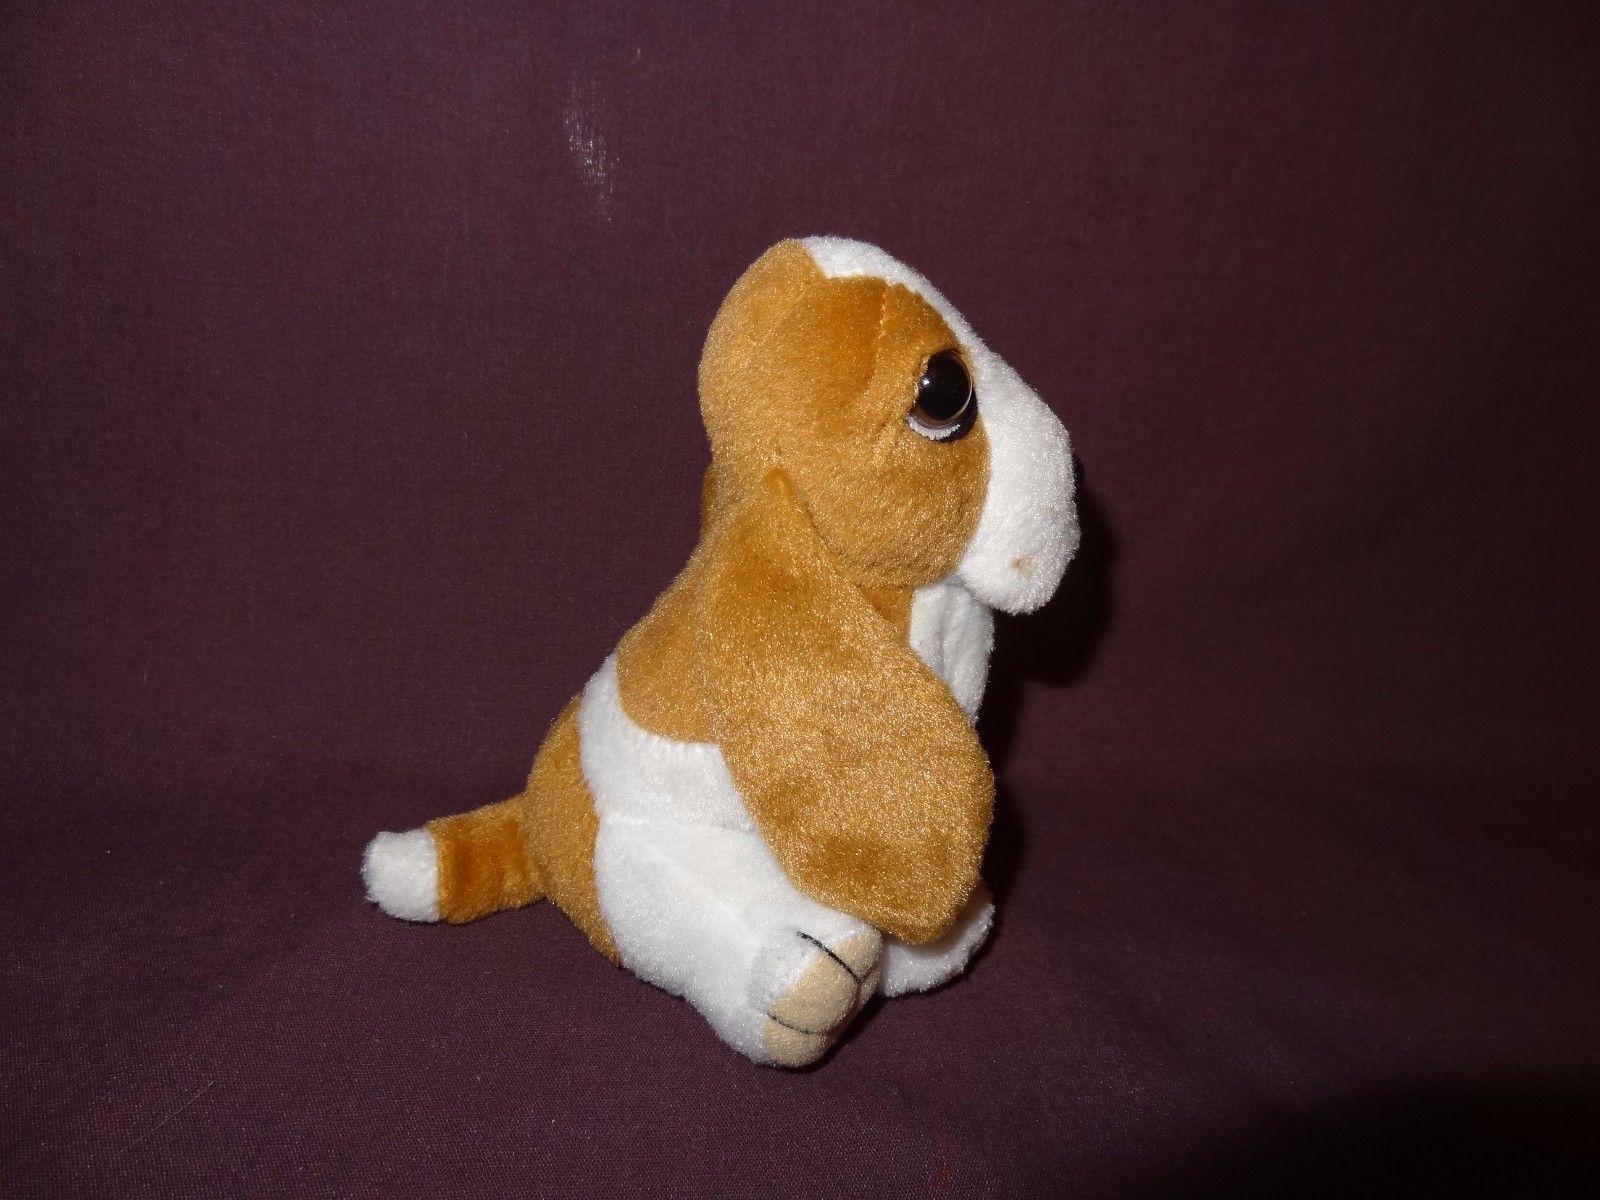 Hush Puppies Dog Plush Stuffed Animal Toy 5 inch Toys Brown White